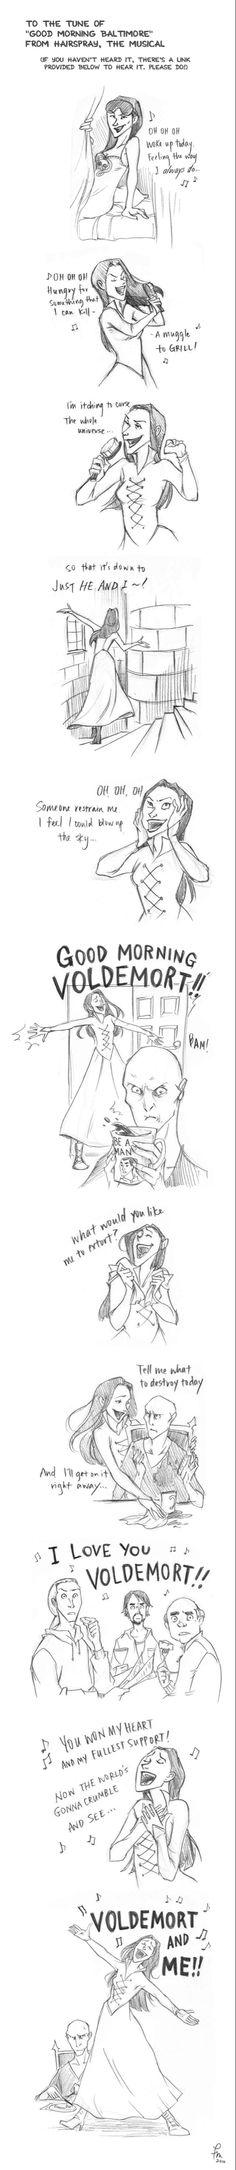 Good Morning Voldemort by flominowa on @DeviantArt